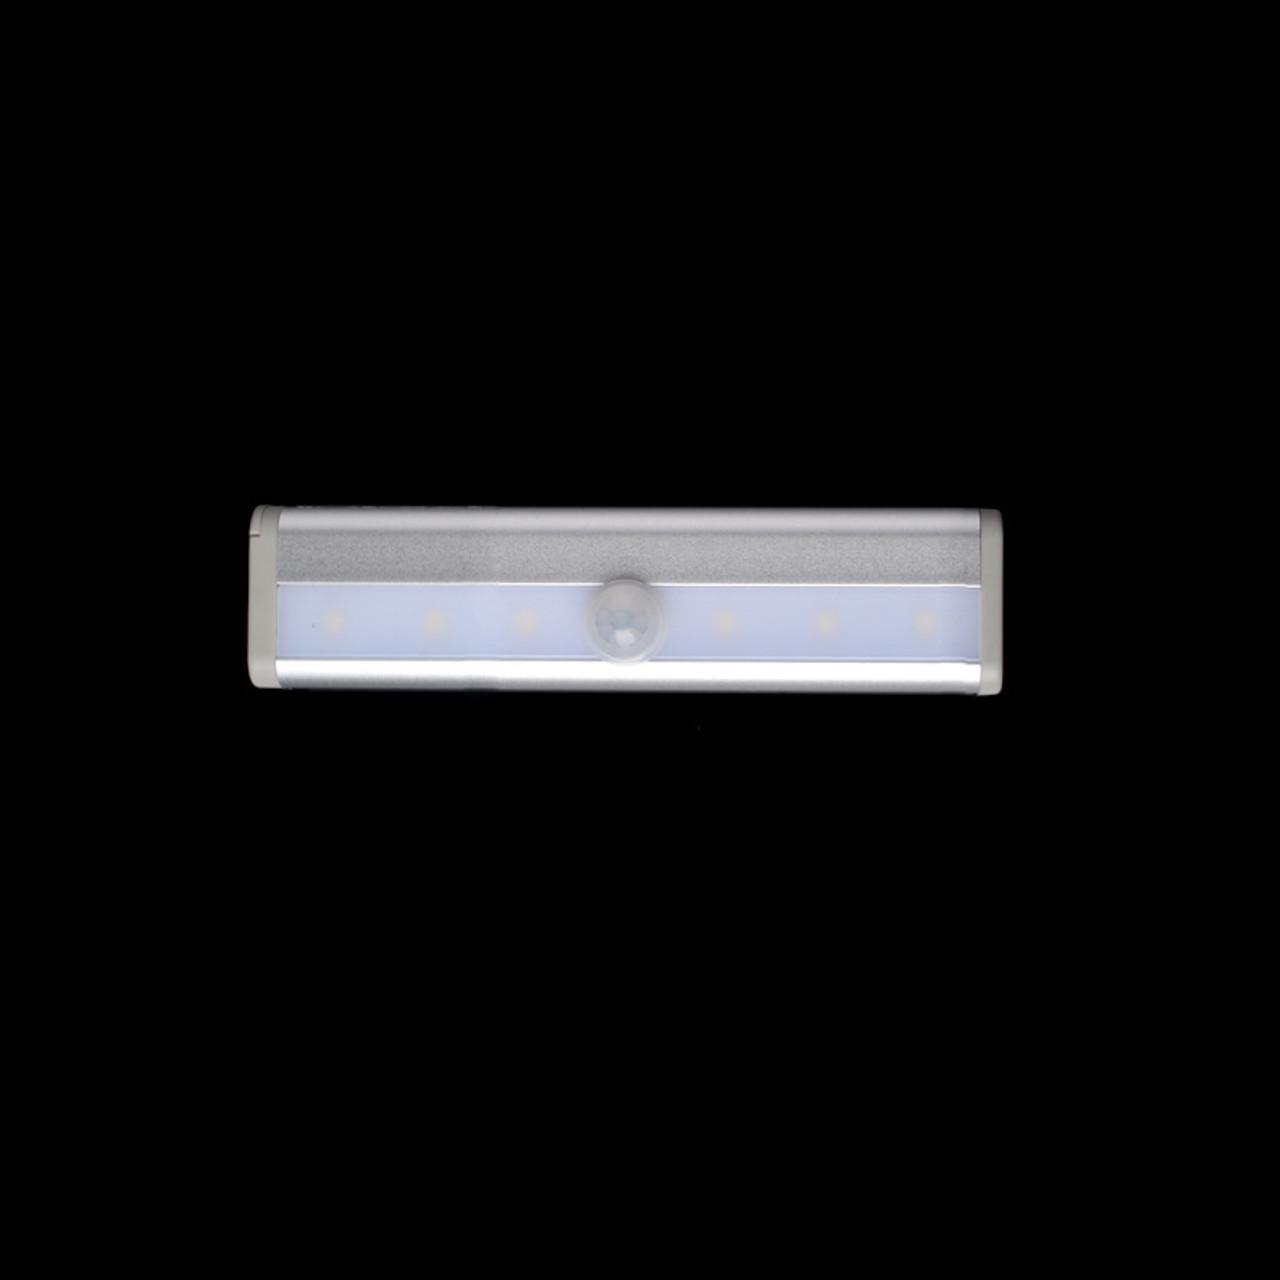 mini led motion sensor kitchen under cabinet shelf counter light battery operated